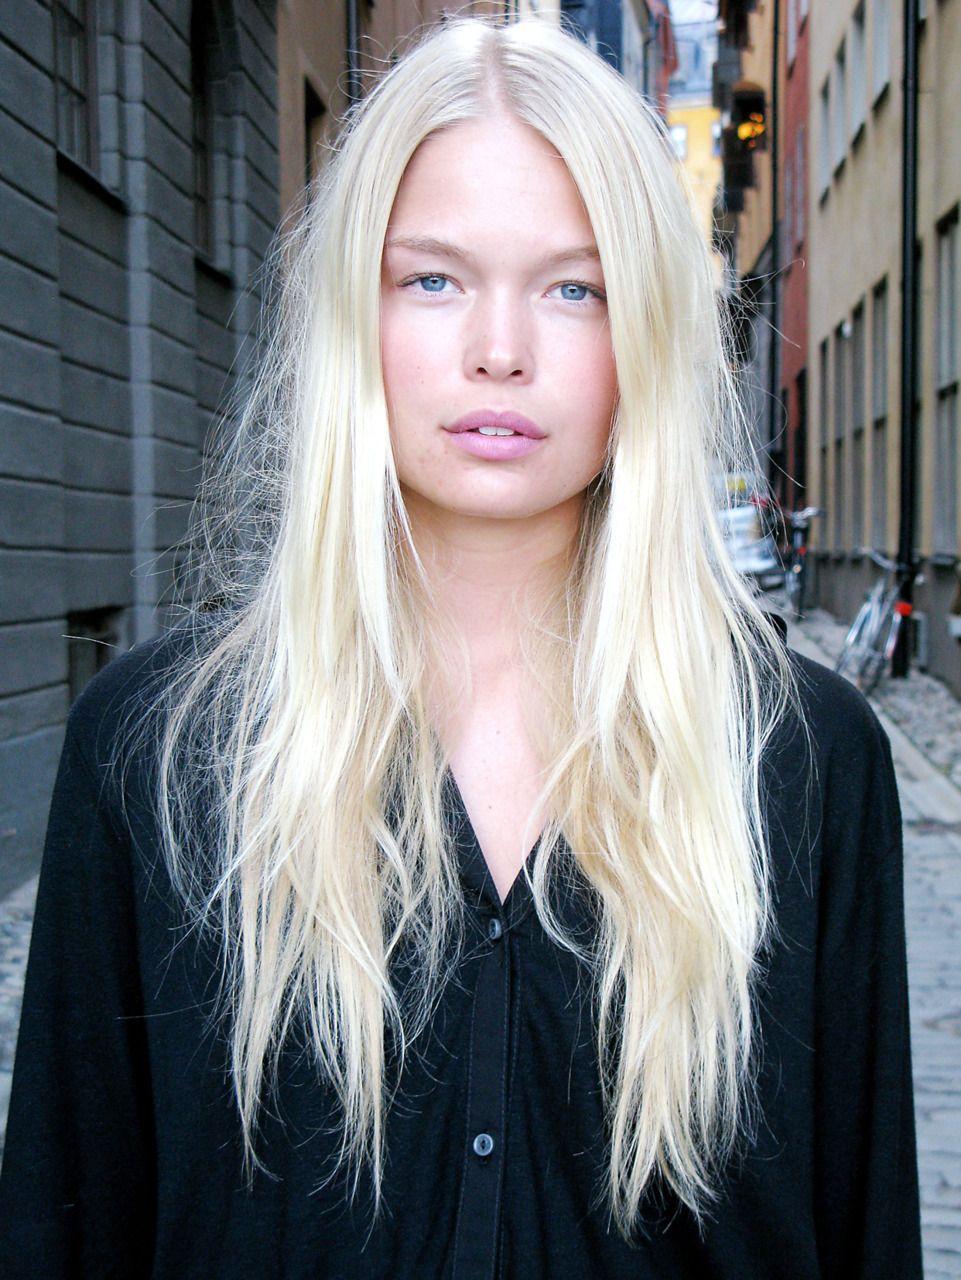 platinum blonde hair fashion model off duty  Platinum